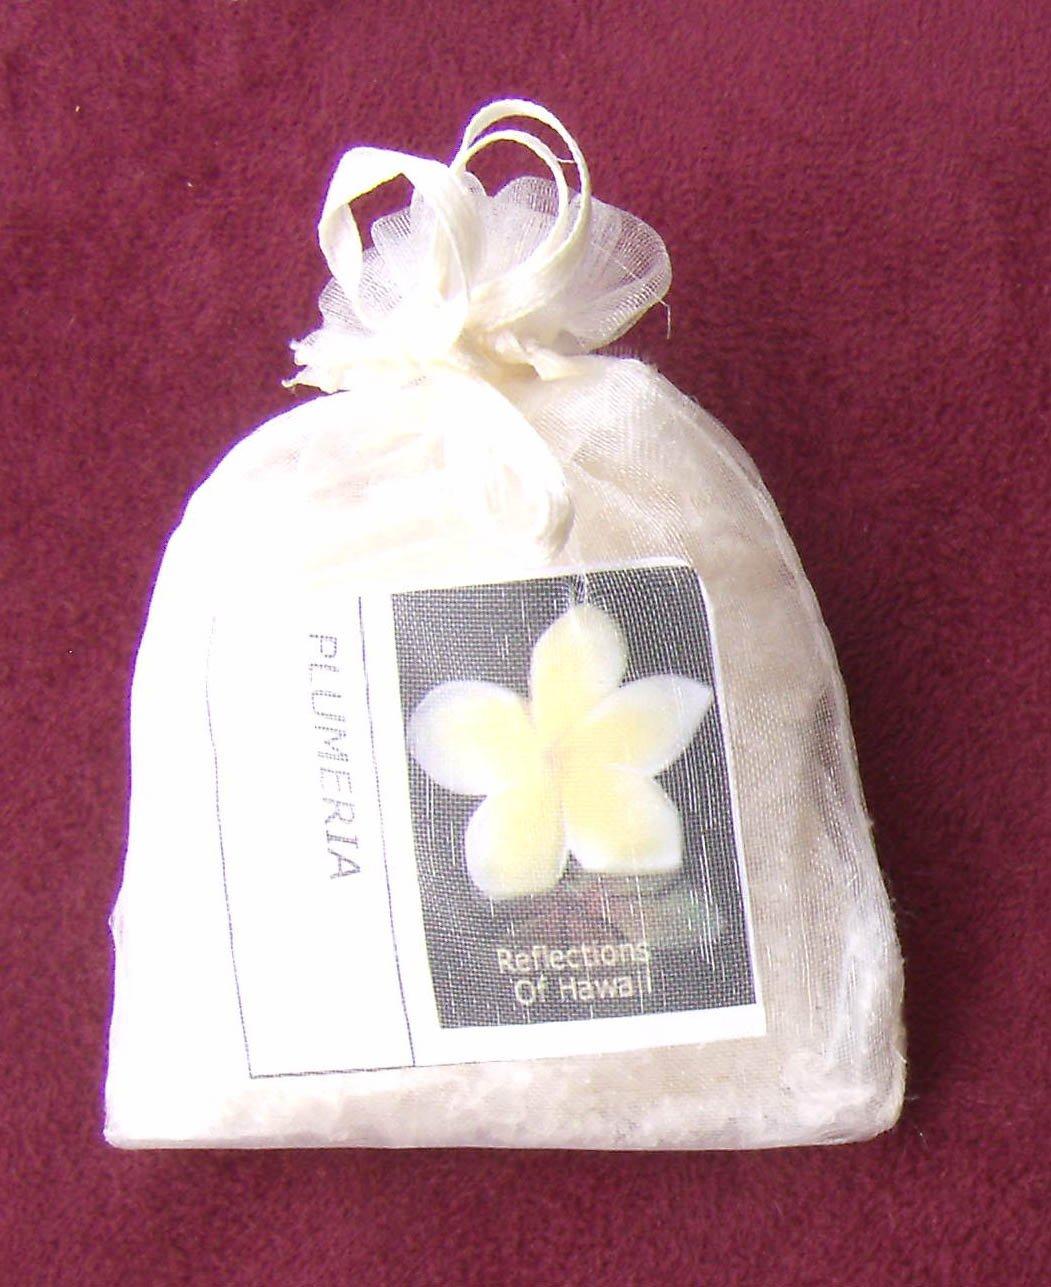 Frangranced bath salts - vanilla-mango fragrance - 8 oz